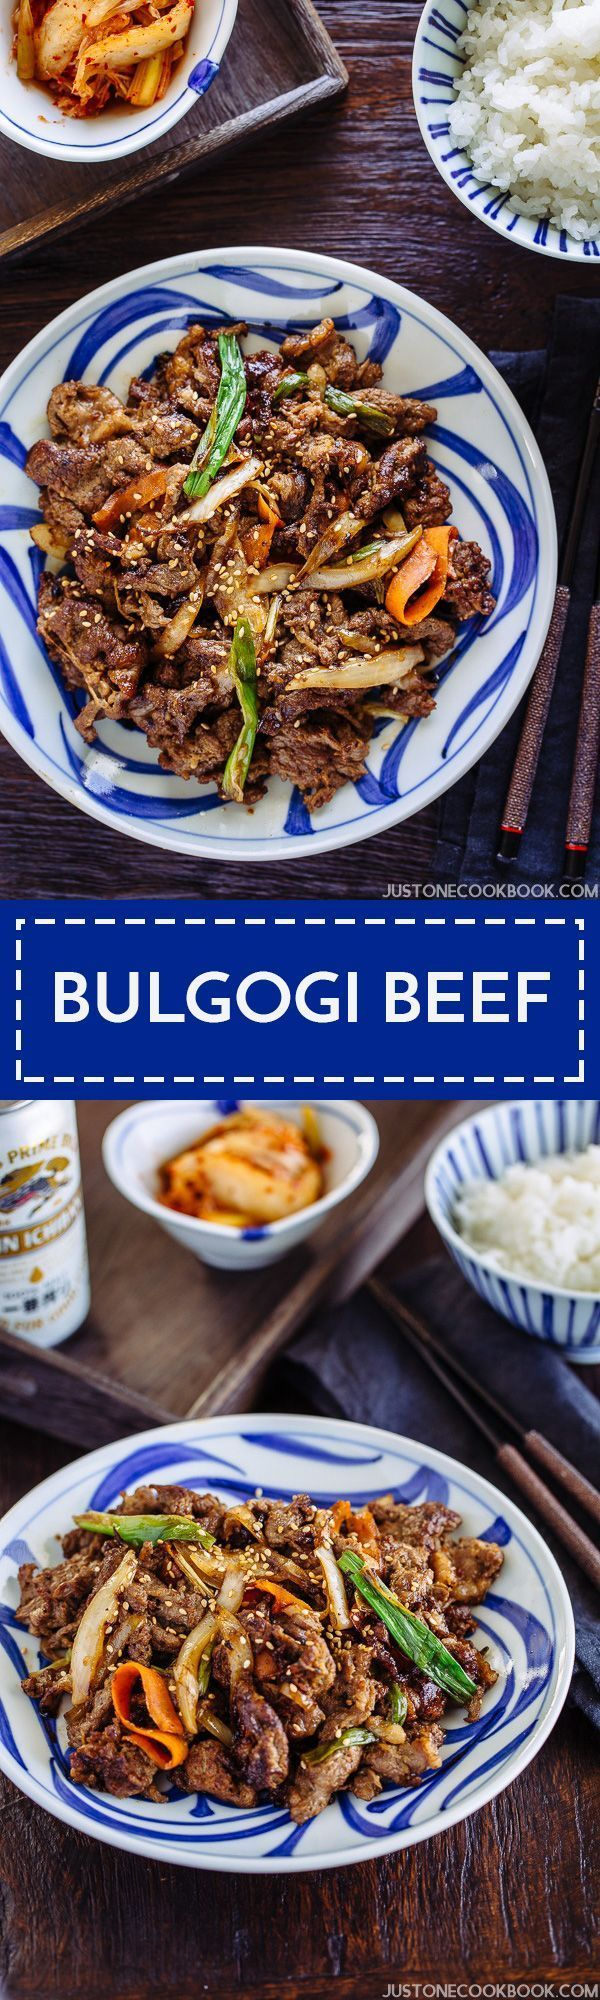 Bulgogi (Korean Grilled Beef) プルコギ | Easy Japanese Recipes at JustOneCookbook.com